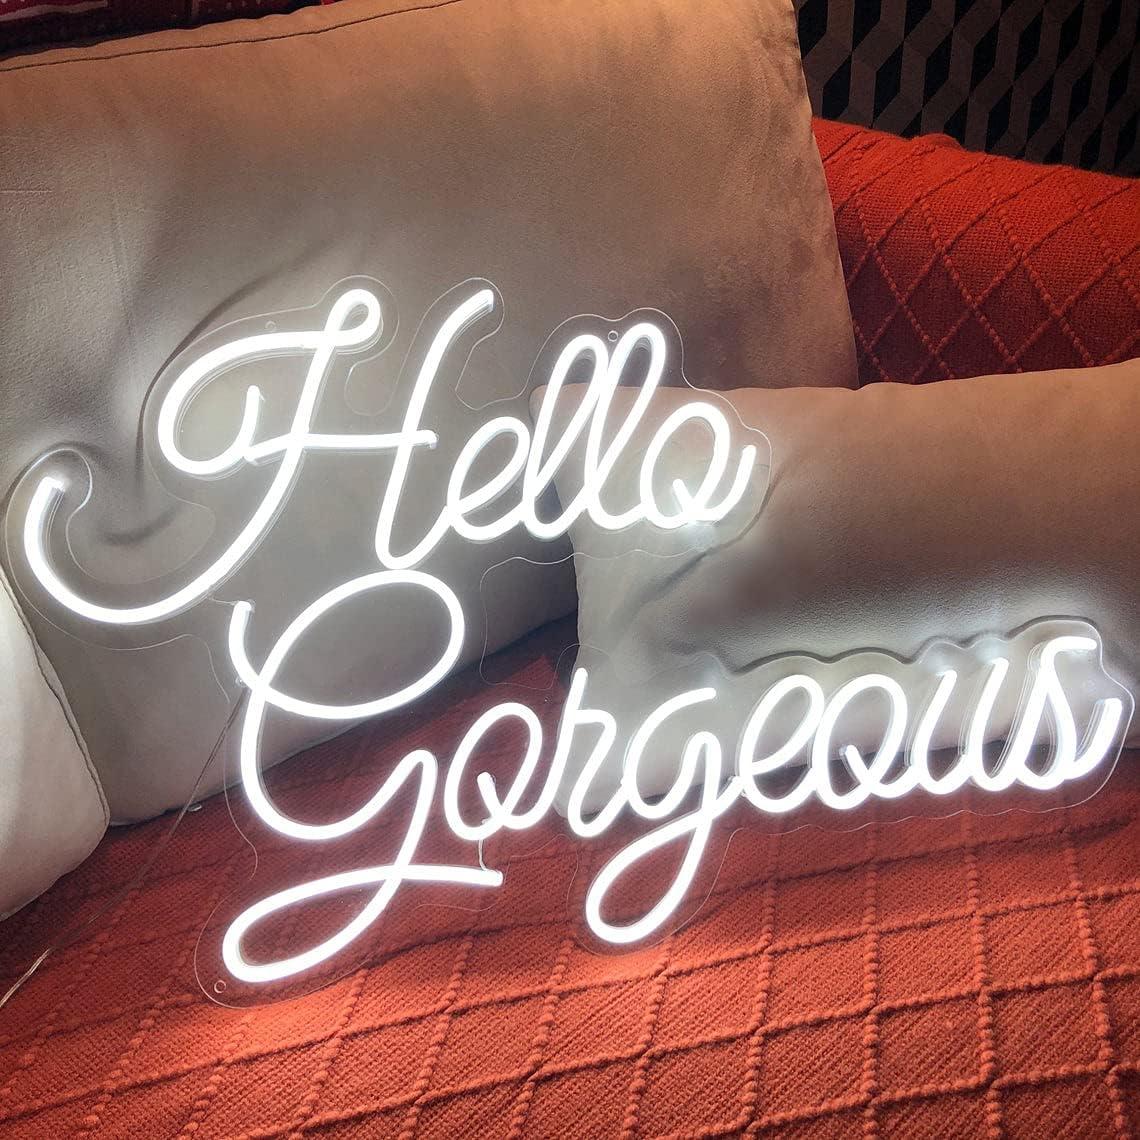 FARNEW Hello Gorgeous Neon Sign Light Wall Art Gifts,Neon Sign Wall Art,Neon Sign Wall Decorations Bar Pub Club Rave Apartment Home Decor Party Christmas Decor (White)